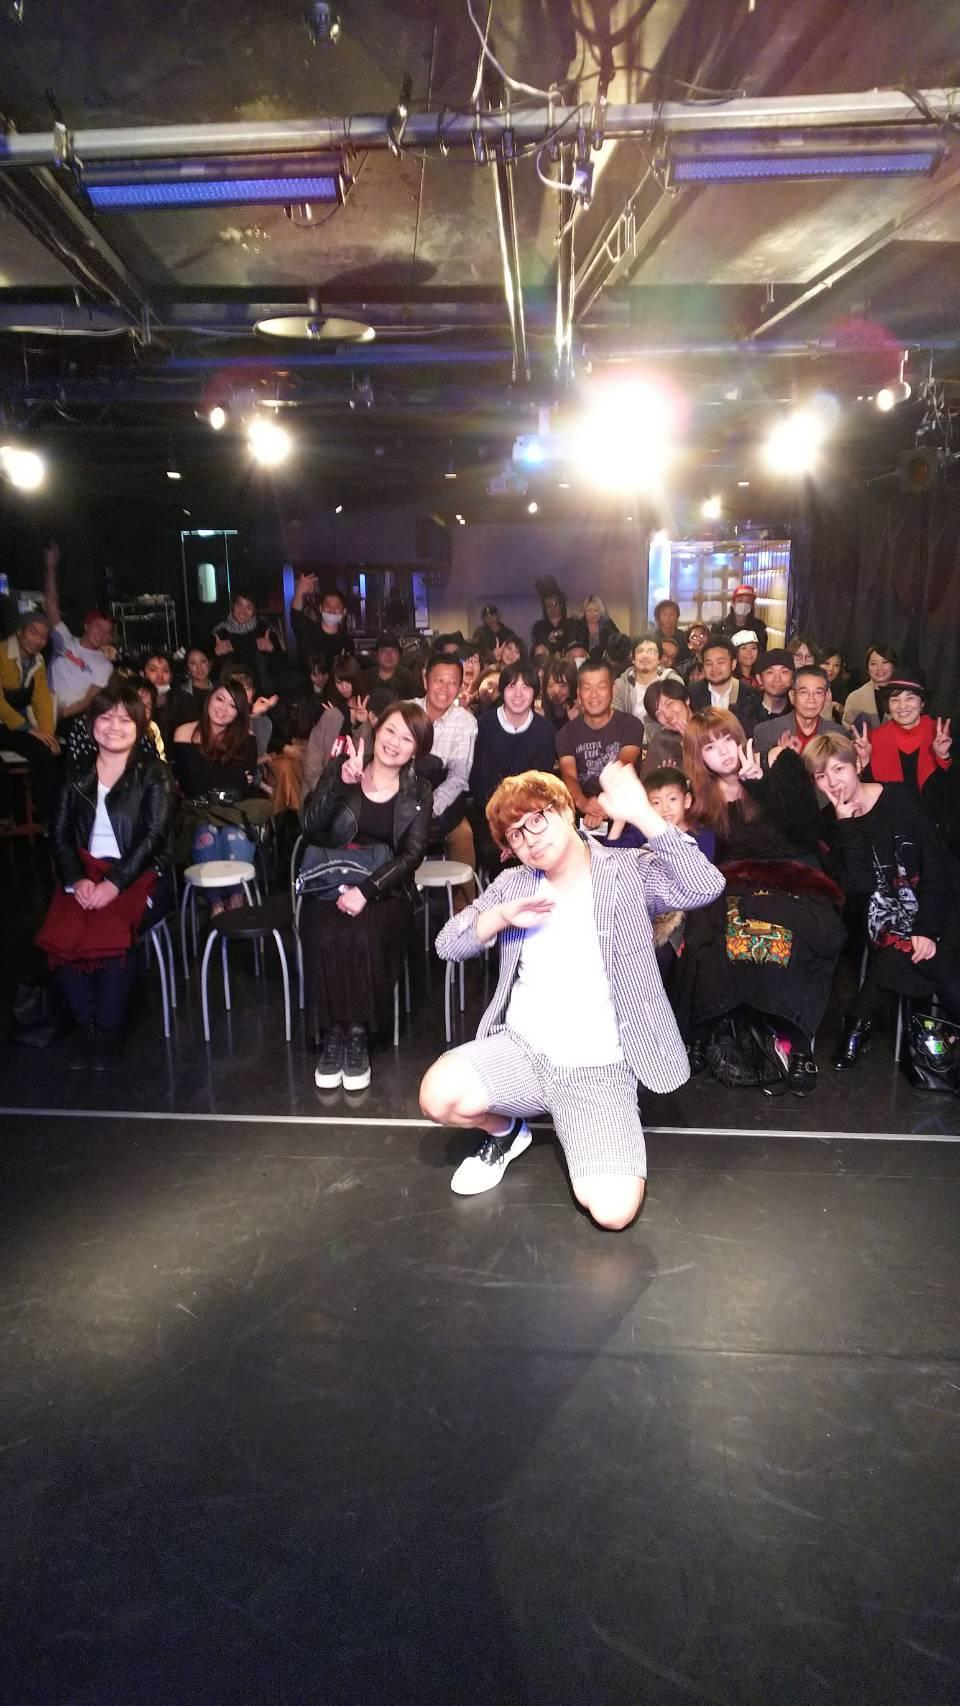 http://news.yoshimoto.co.jp/20171113185756-cc82ce3324f83cf4a8abc03054f563afa08d240f.jpg